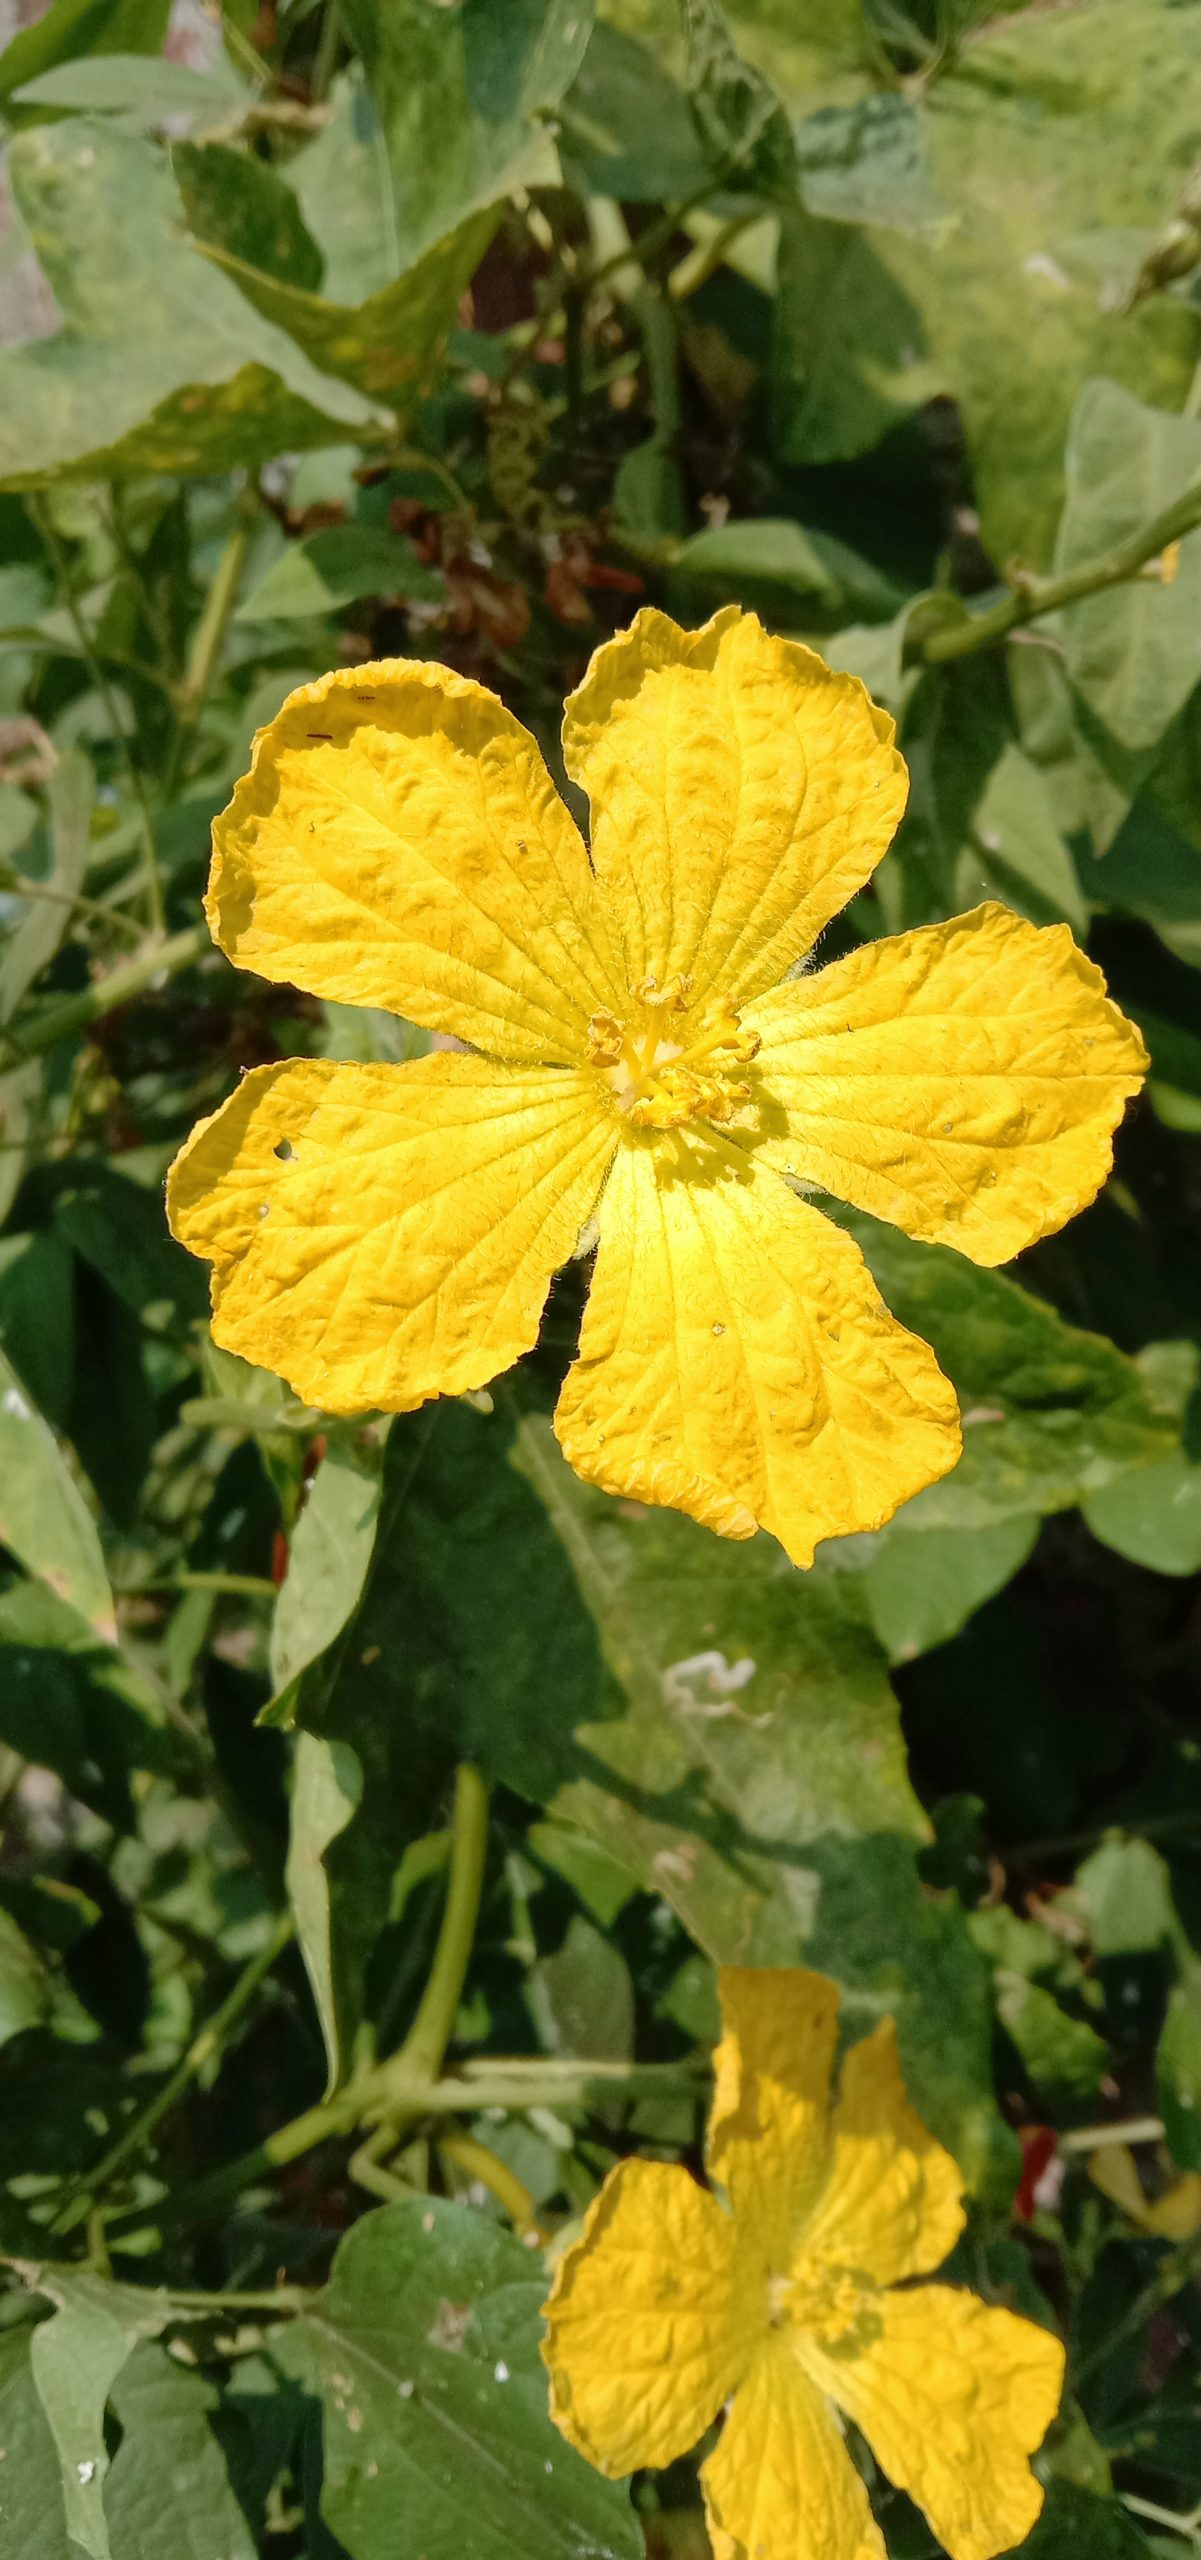 Sponge gourd flower Close-up